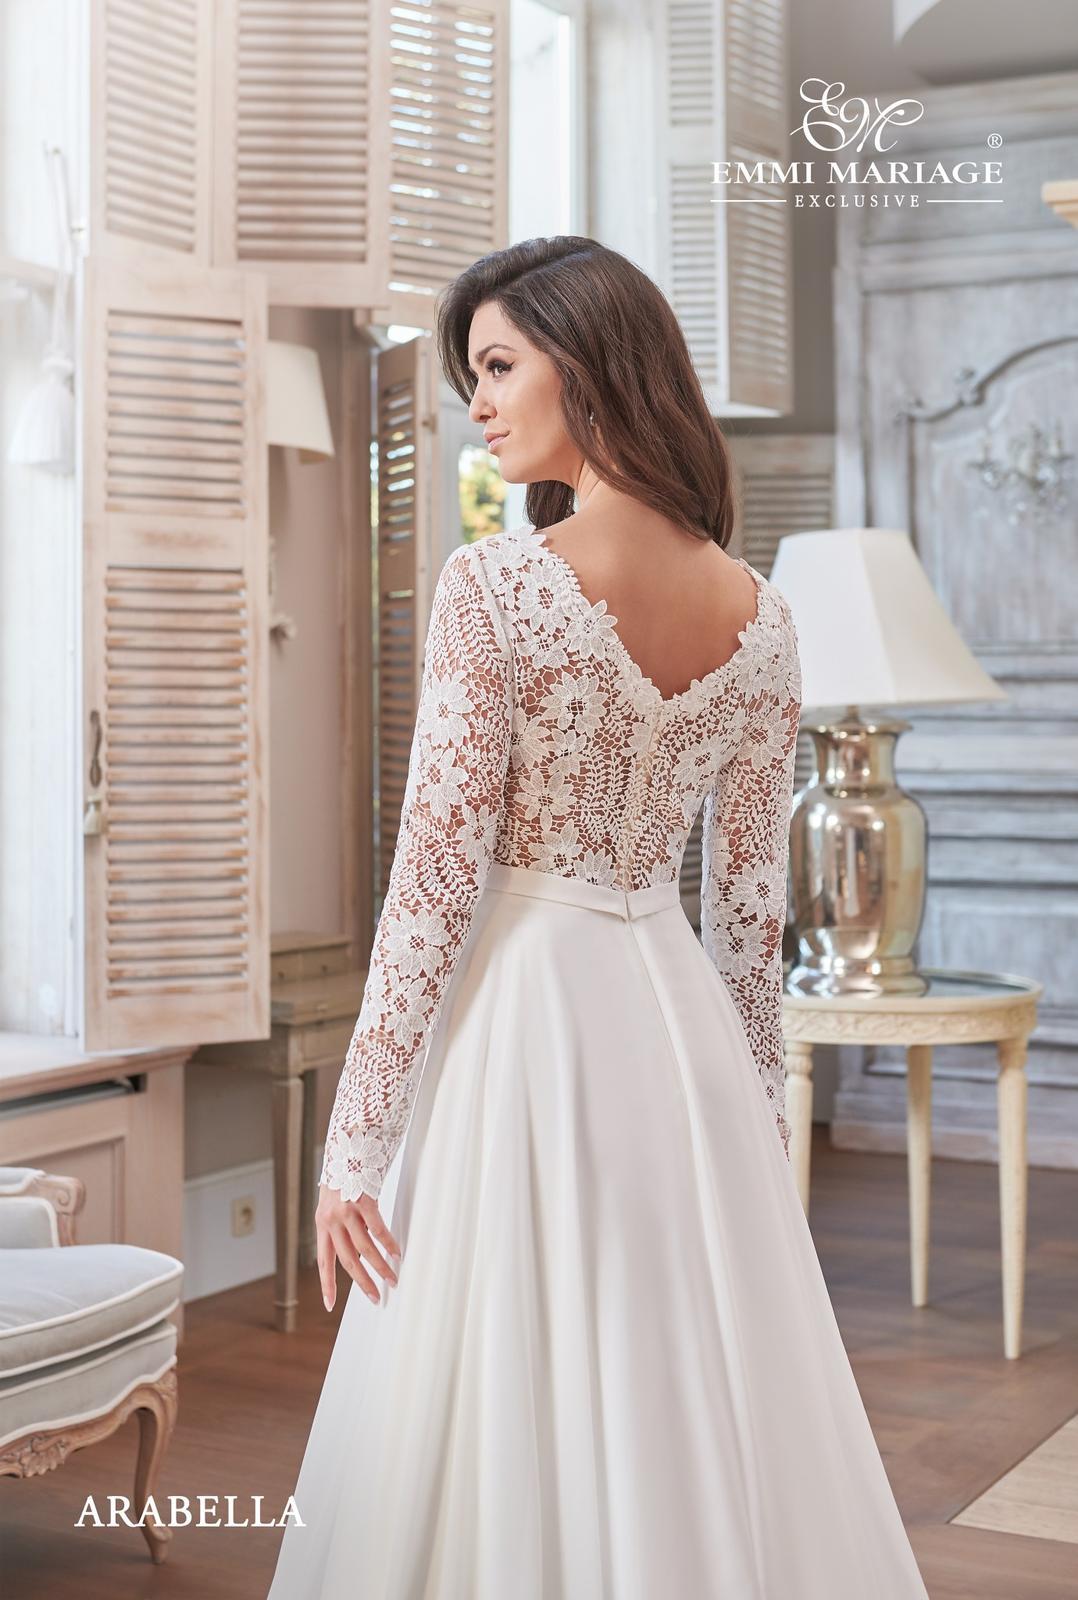 @aknajjanka Lehké, jednoduché šaty... - Obrázek č. 2